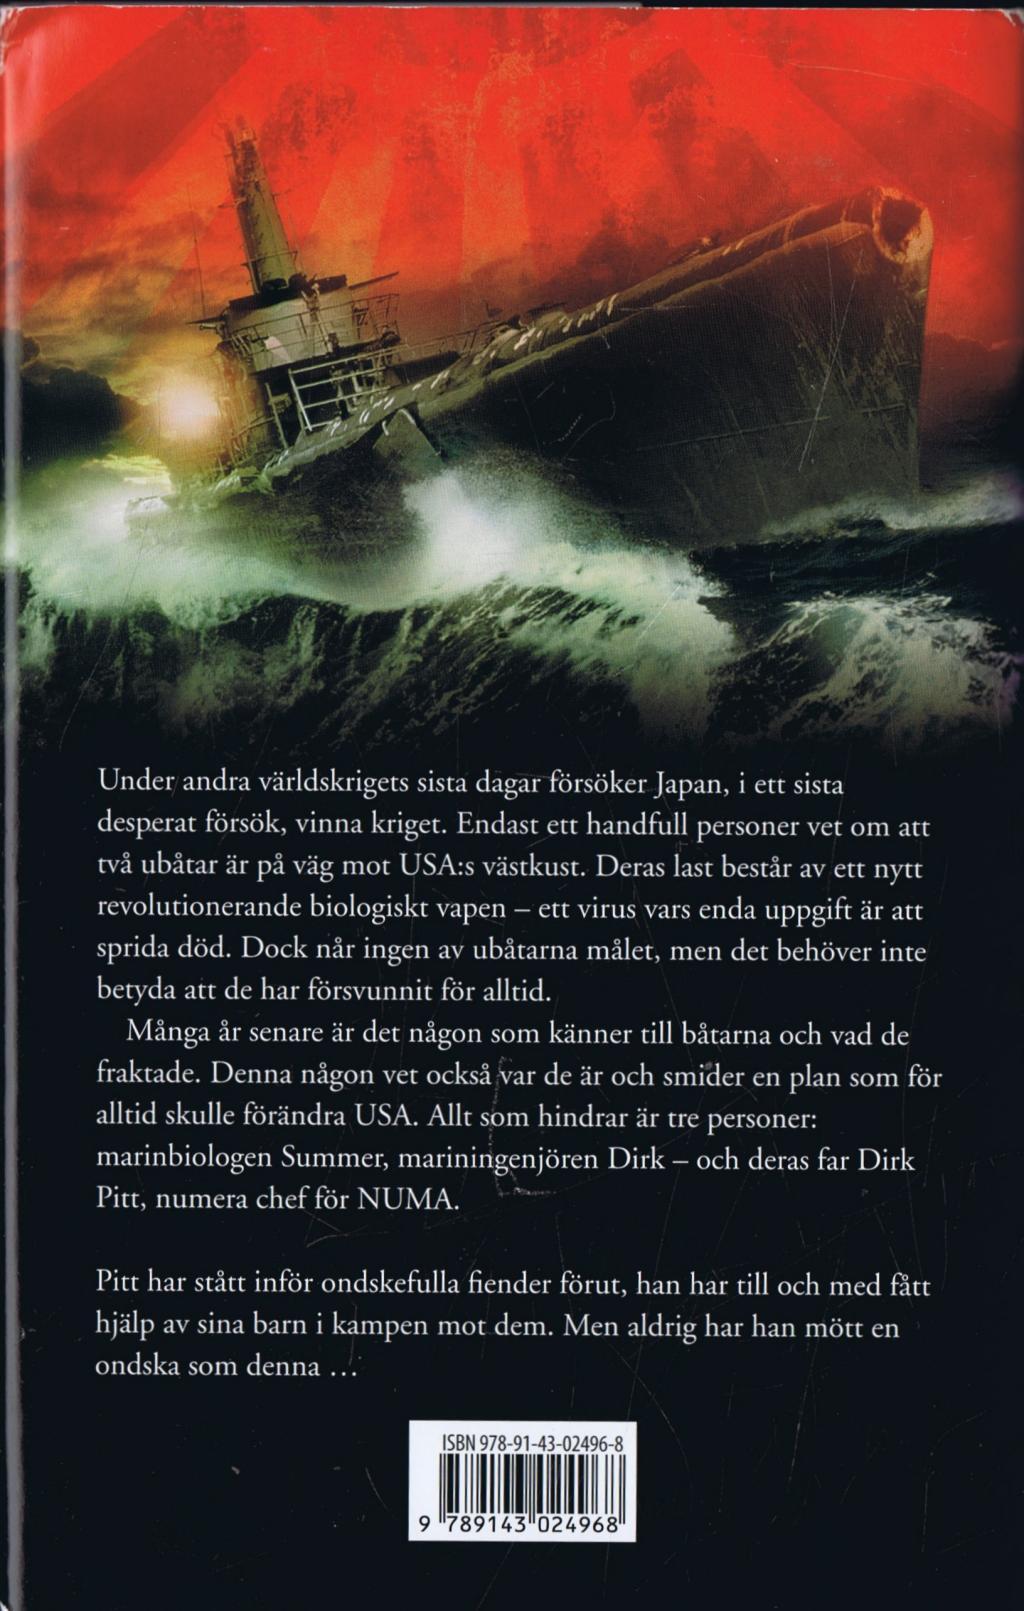 Dirk Pitt: Black Wind by Dirk Cussler and Clive Cussler (2004, CD, Unabridged)